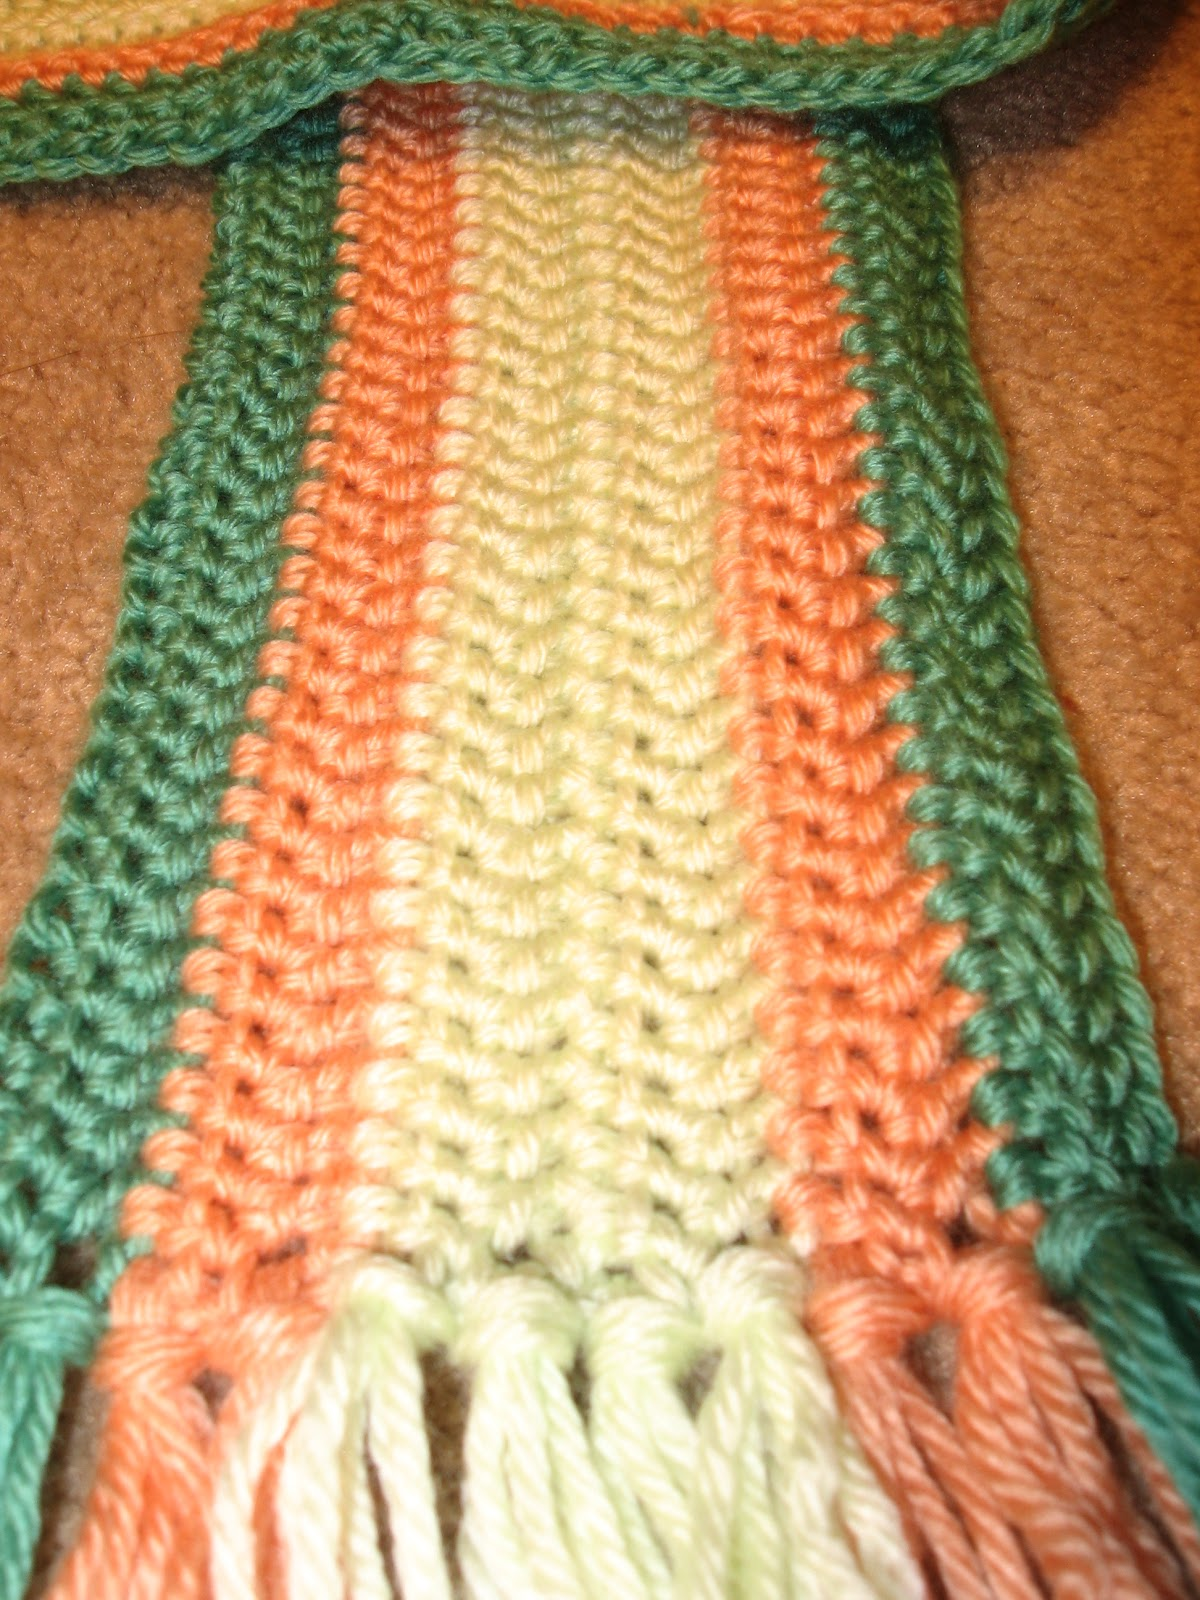 Crafting Adventures: Vertical Stripe Scarf